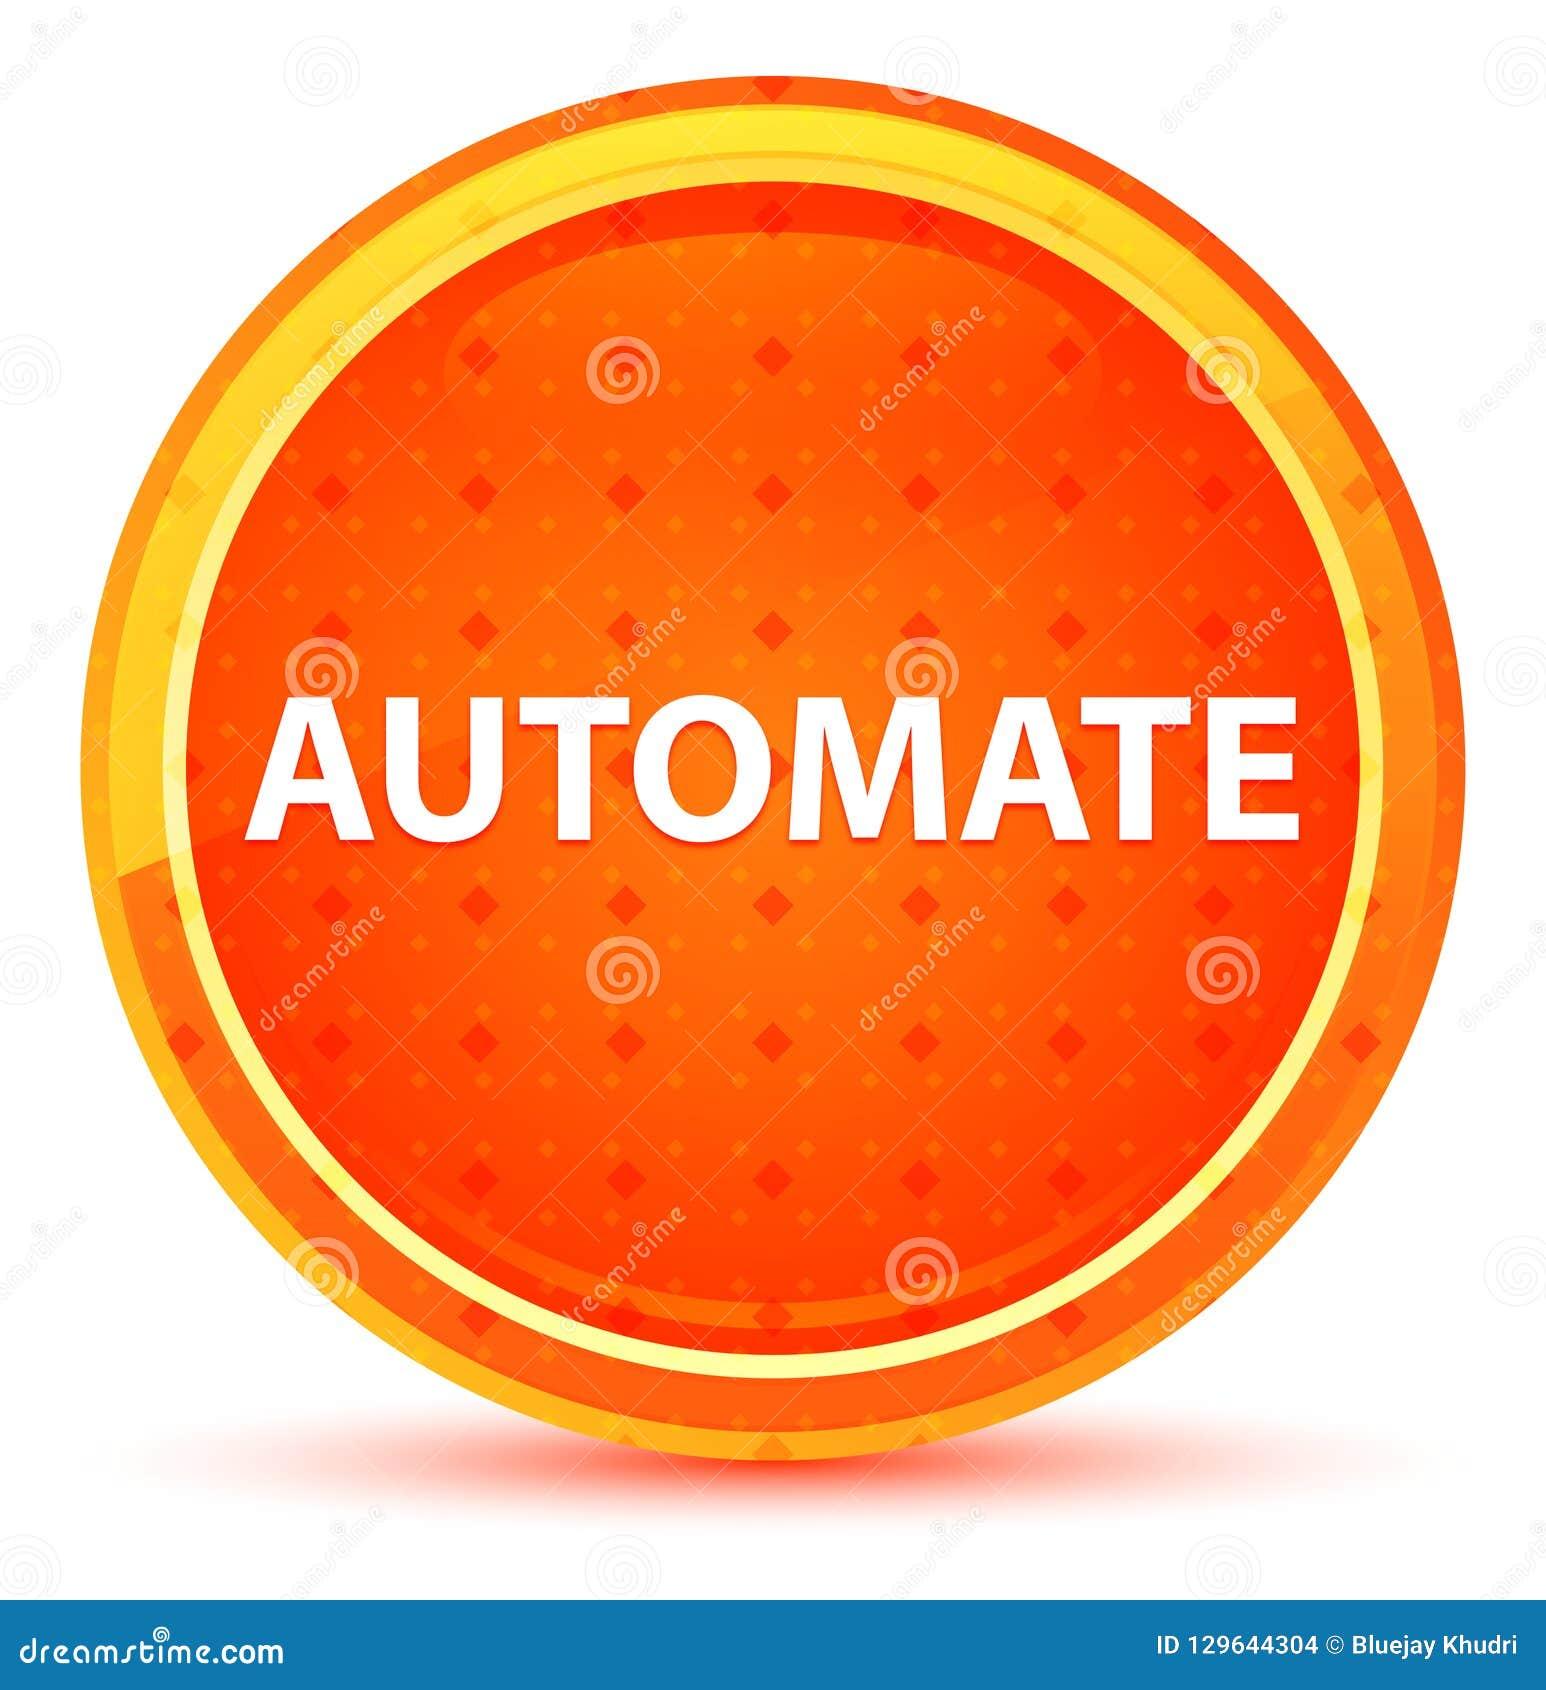 Automate Natural Orange Round Button